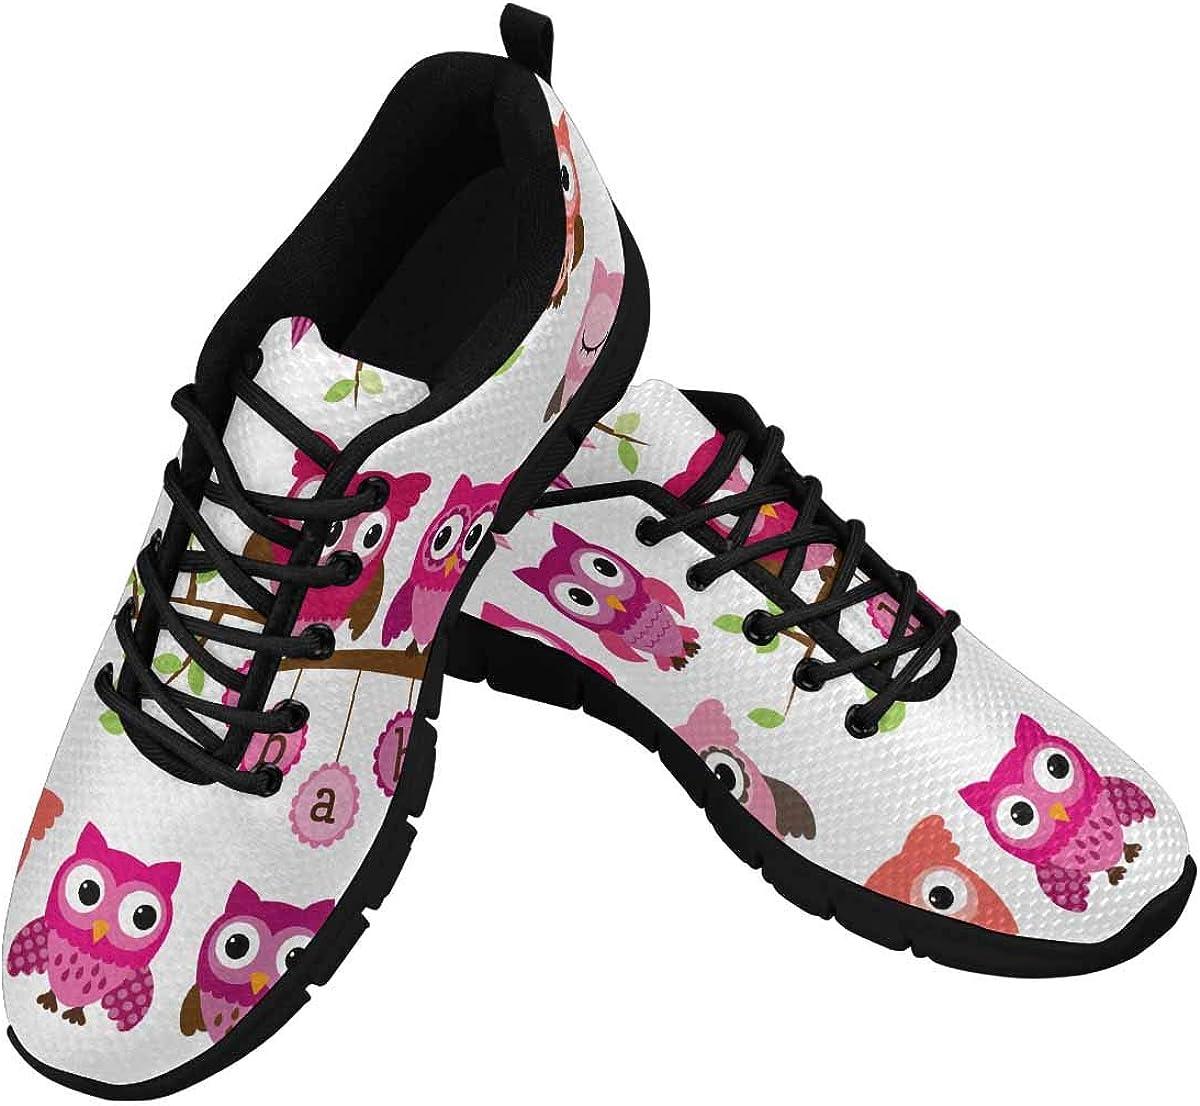 INTERESTPRINT Cute Cartoon Owls Background Women's Athletic Walking Shoes Casual Mesh Comfortable Work Sneakers